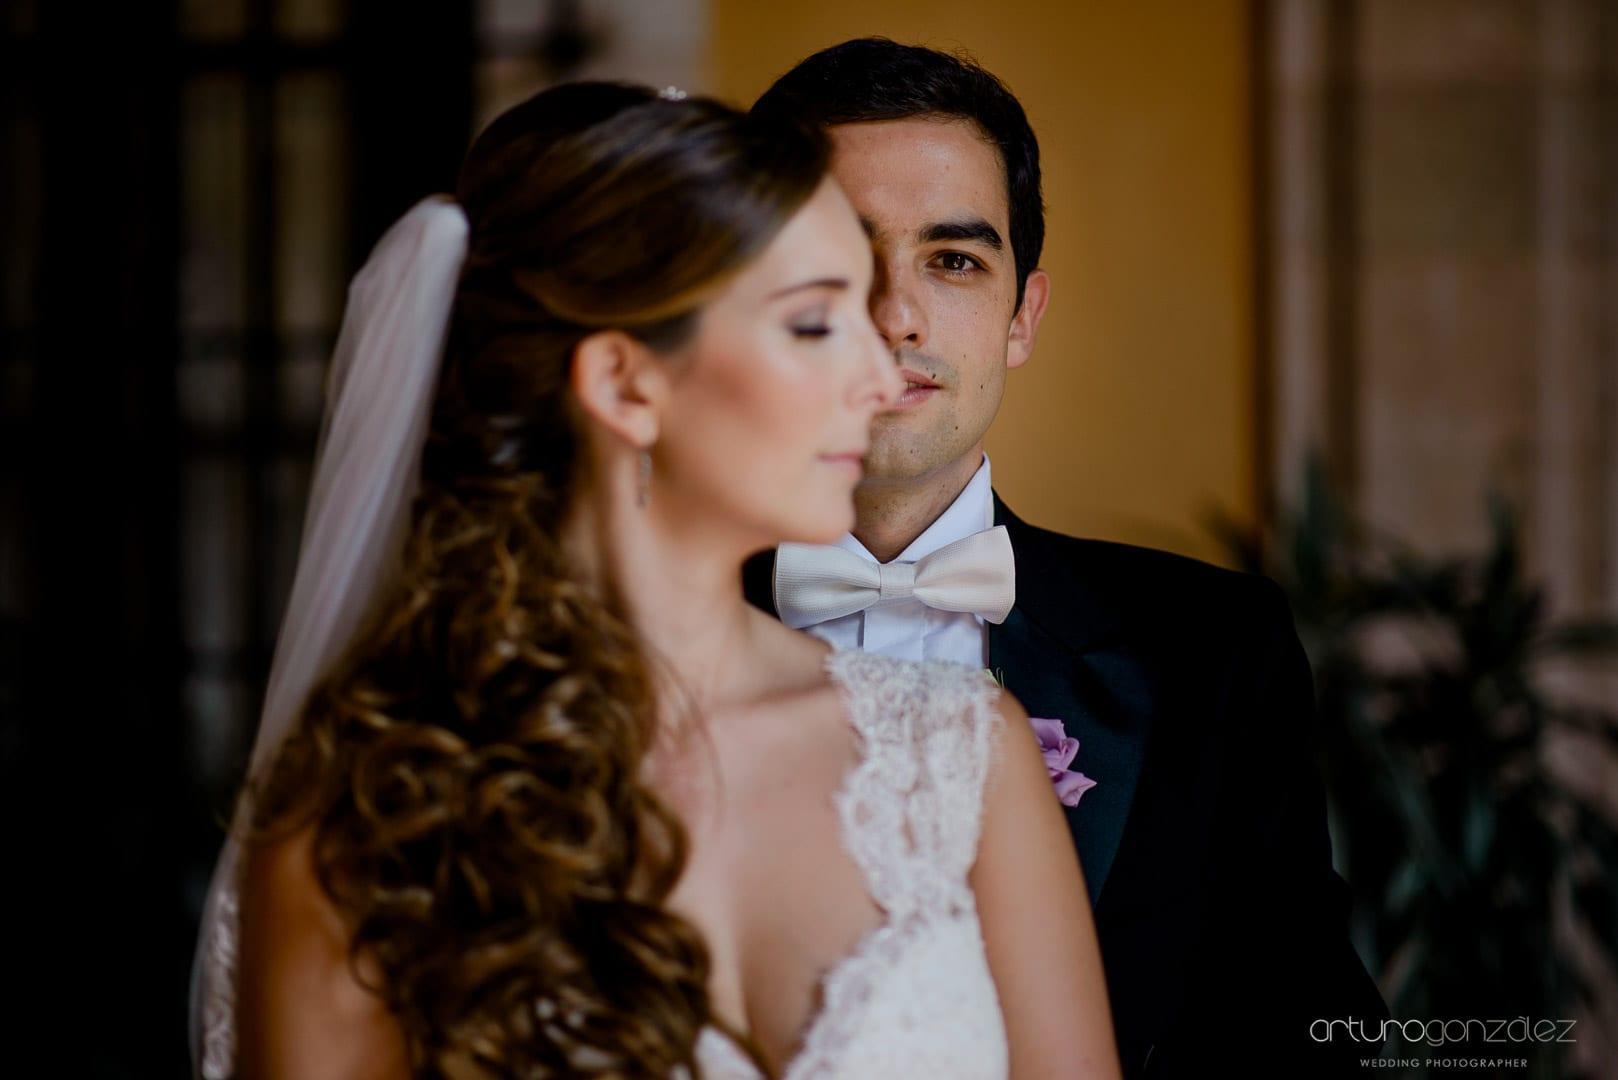 fotografo-de-bodas-en-guanajuato-35